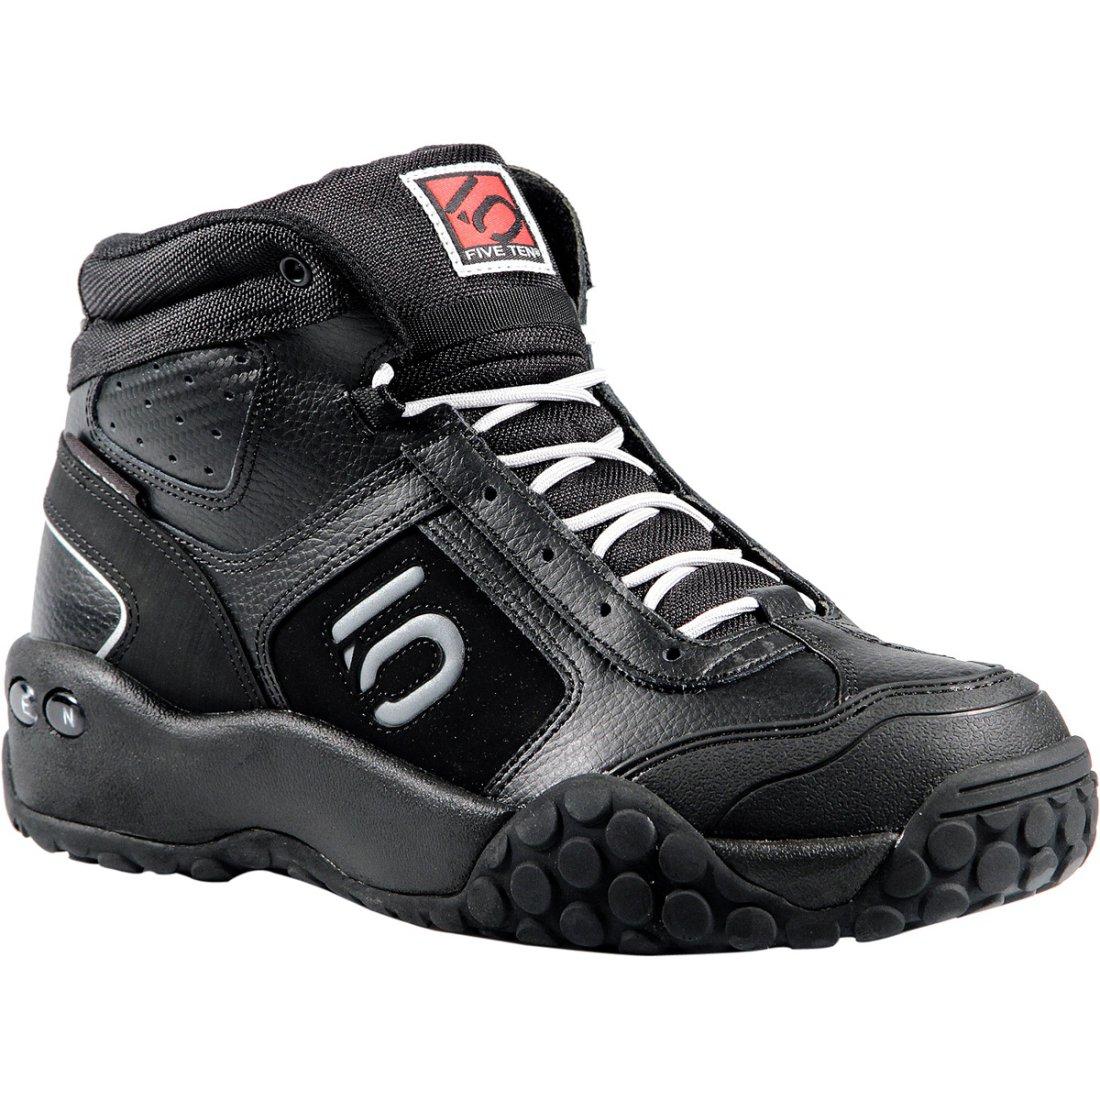 Chaussures Impact · High Five Black Motocard Ten Team xQrBtshdC